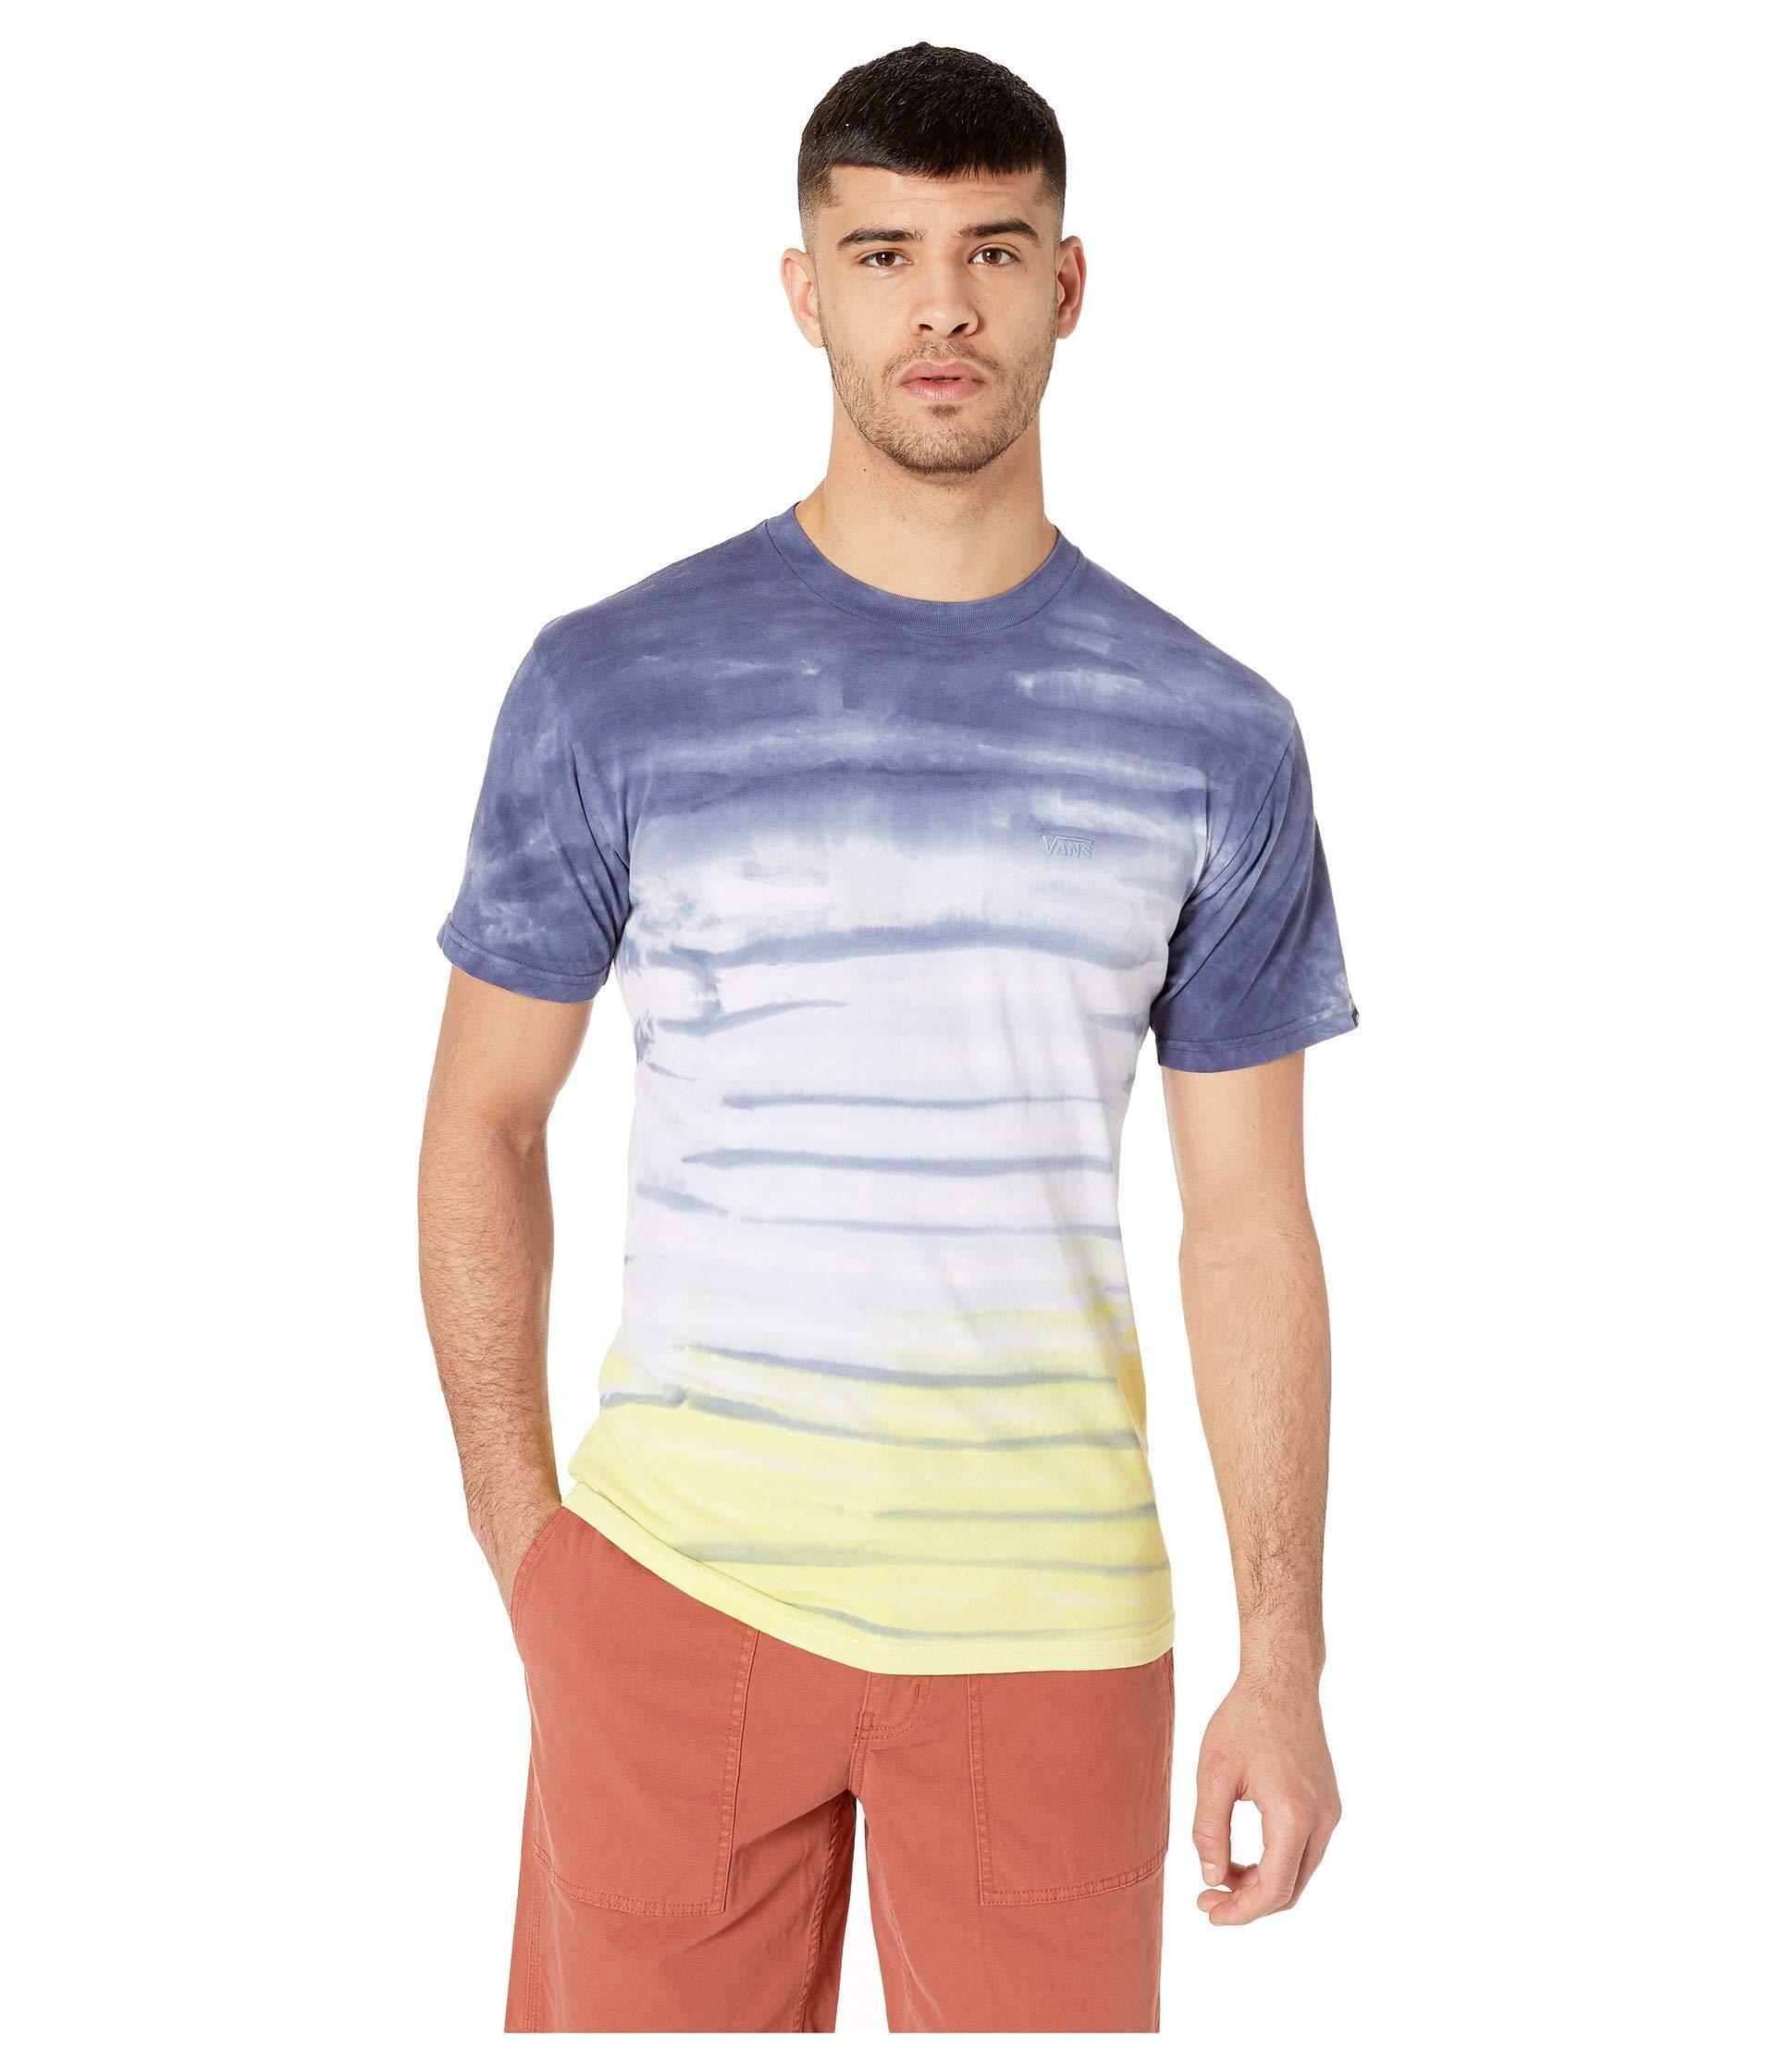 Reef Sunset Short Sleeve T-Shirt in Navy